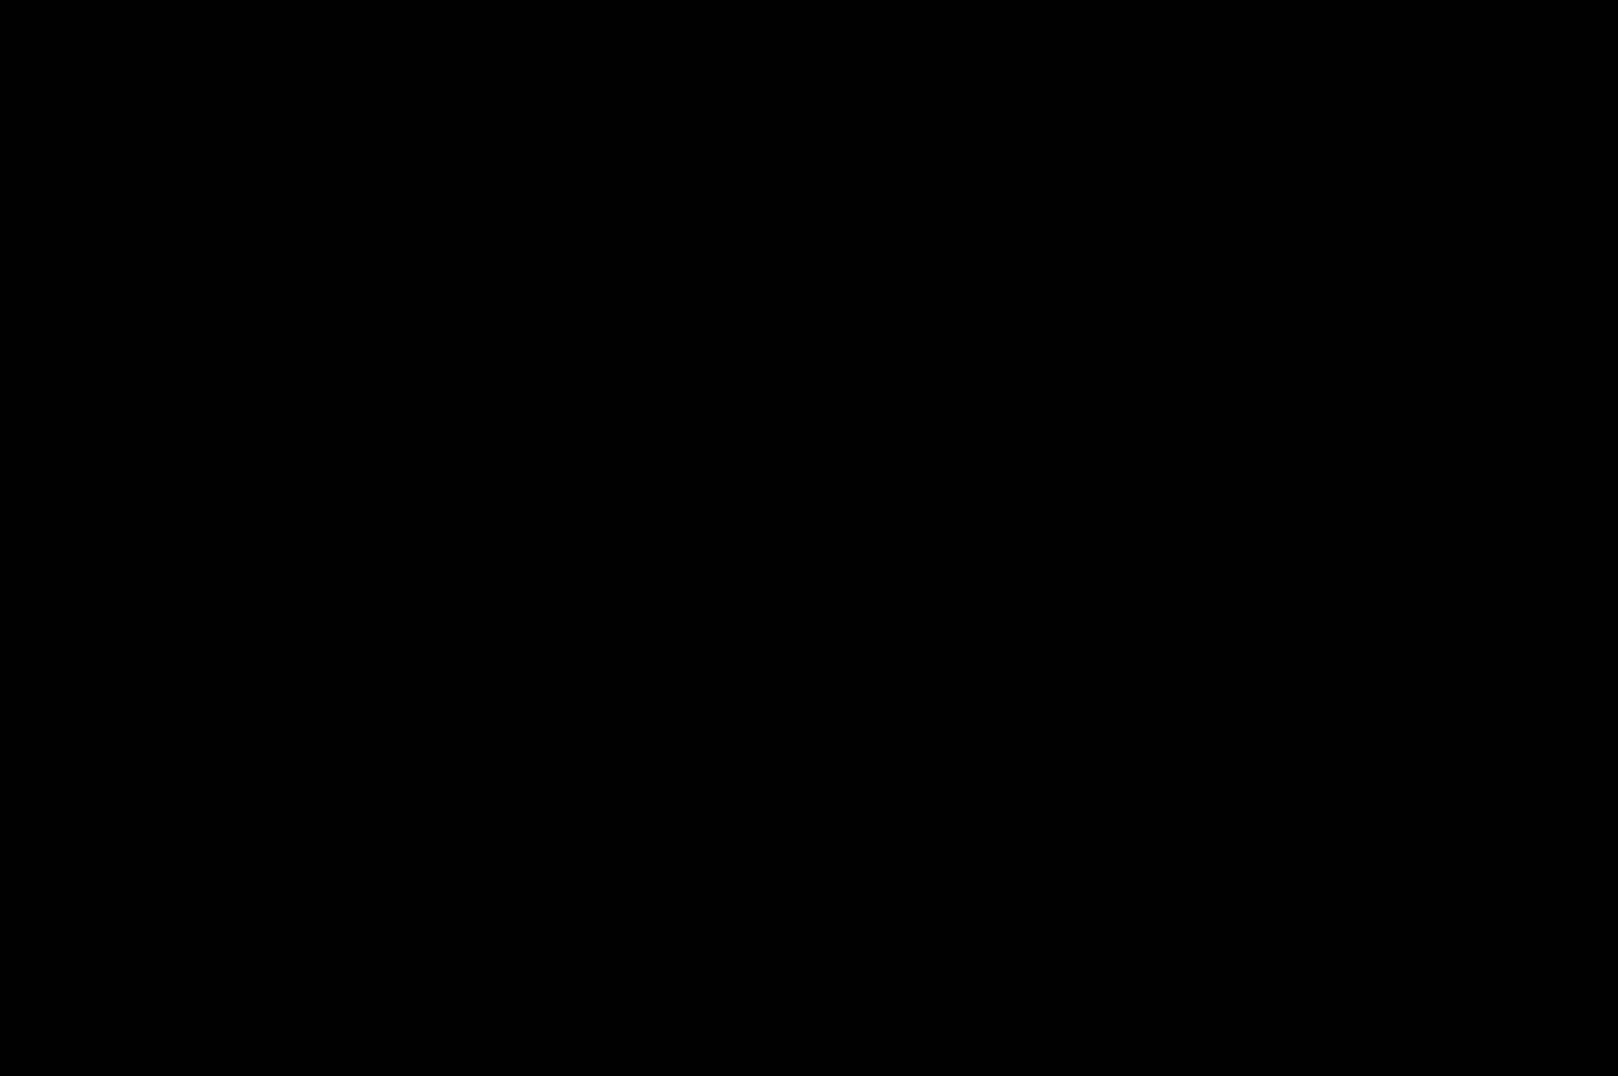 1618x1076 Clipart